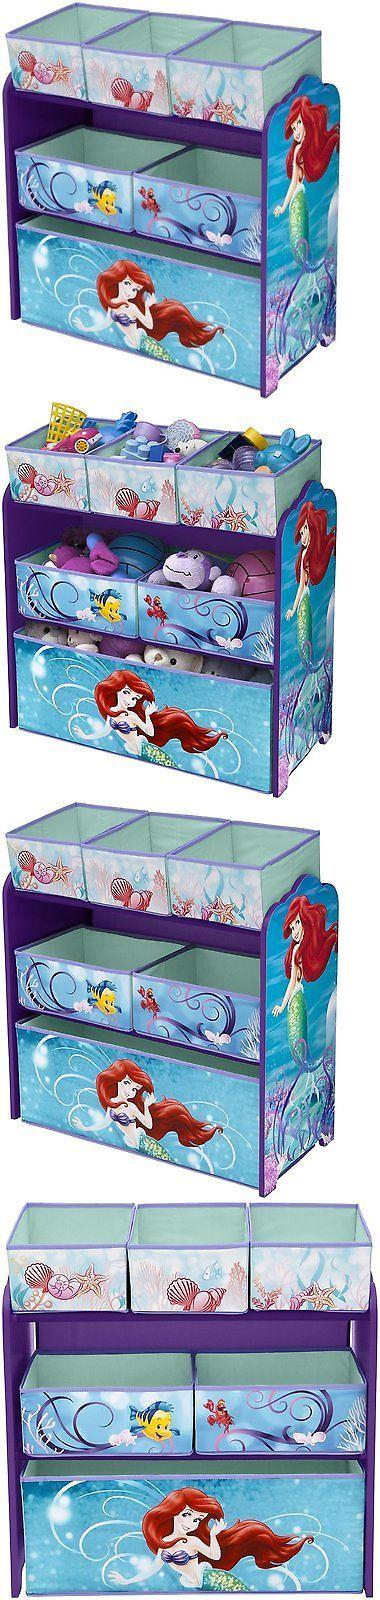 Toy Boxes 94932: Disney Little Mermaid Multi-Bin Toy Organizer -> BUY IT NOW ONLY: $40.19 on eBay!